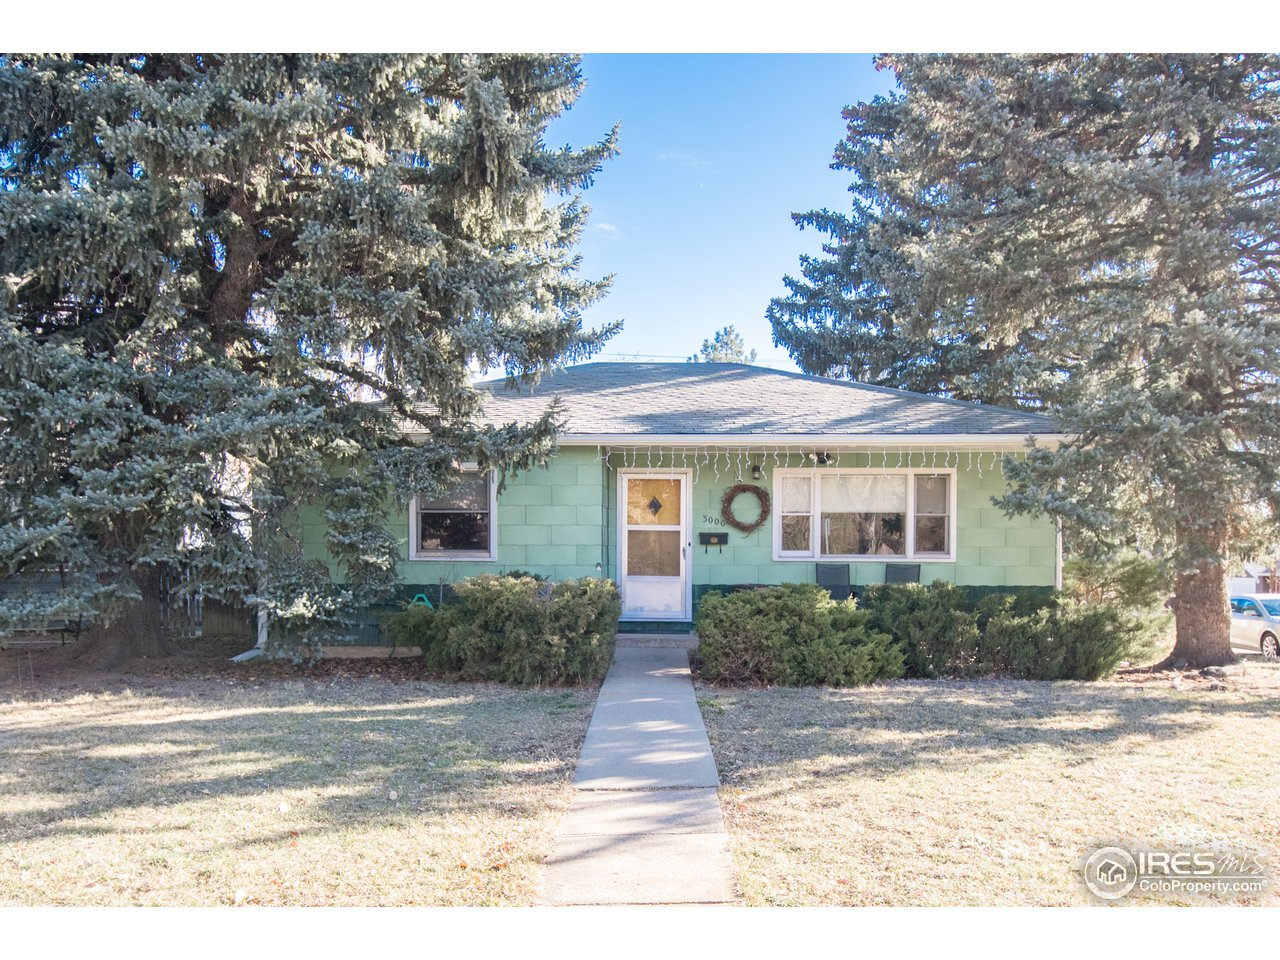 3000 11th St, Boulder CO 80304